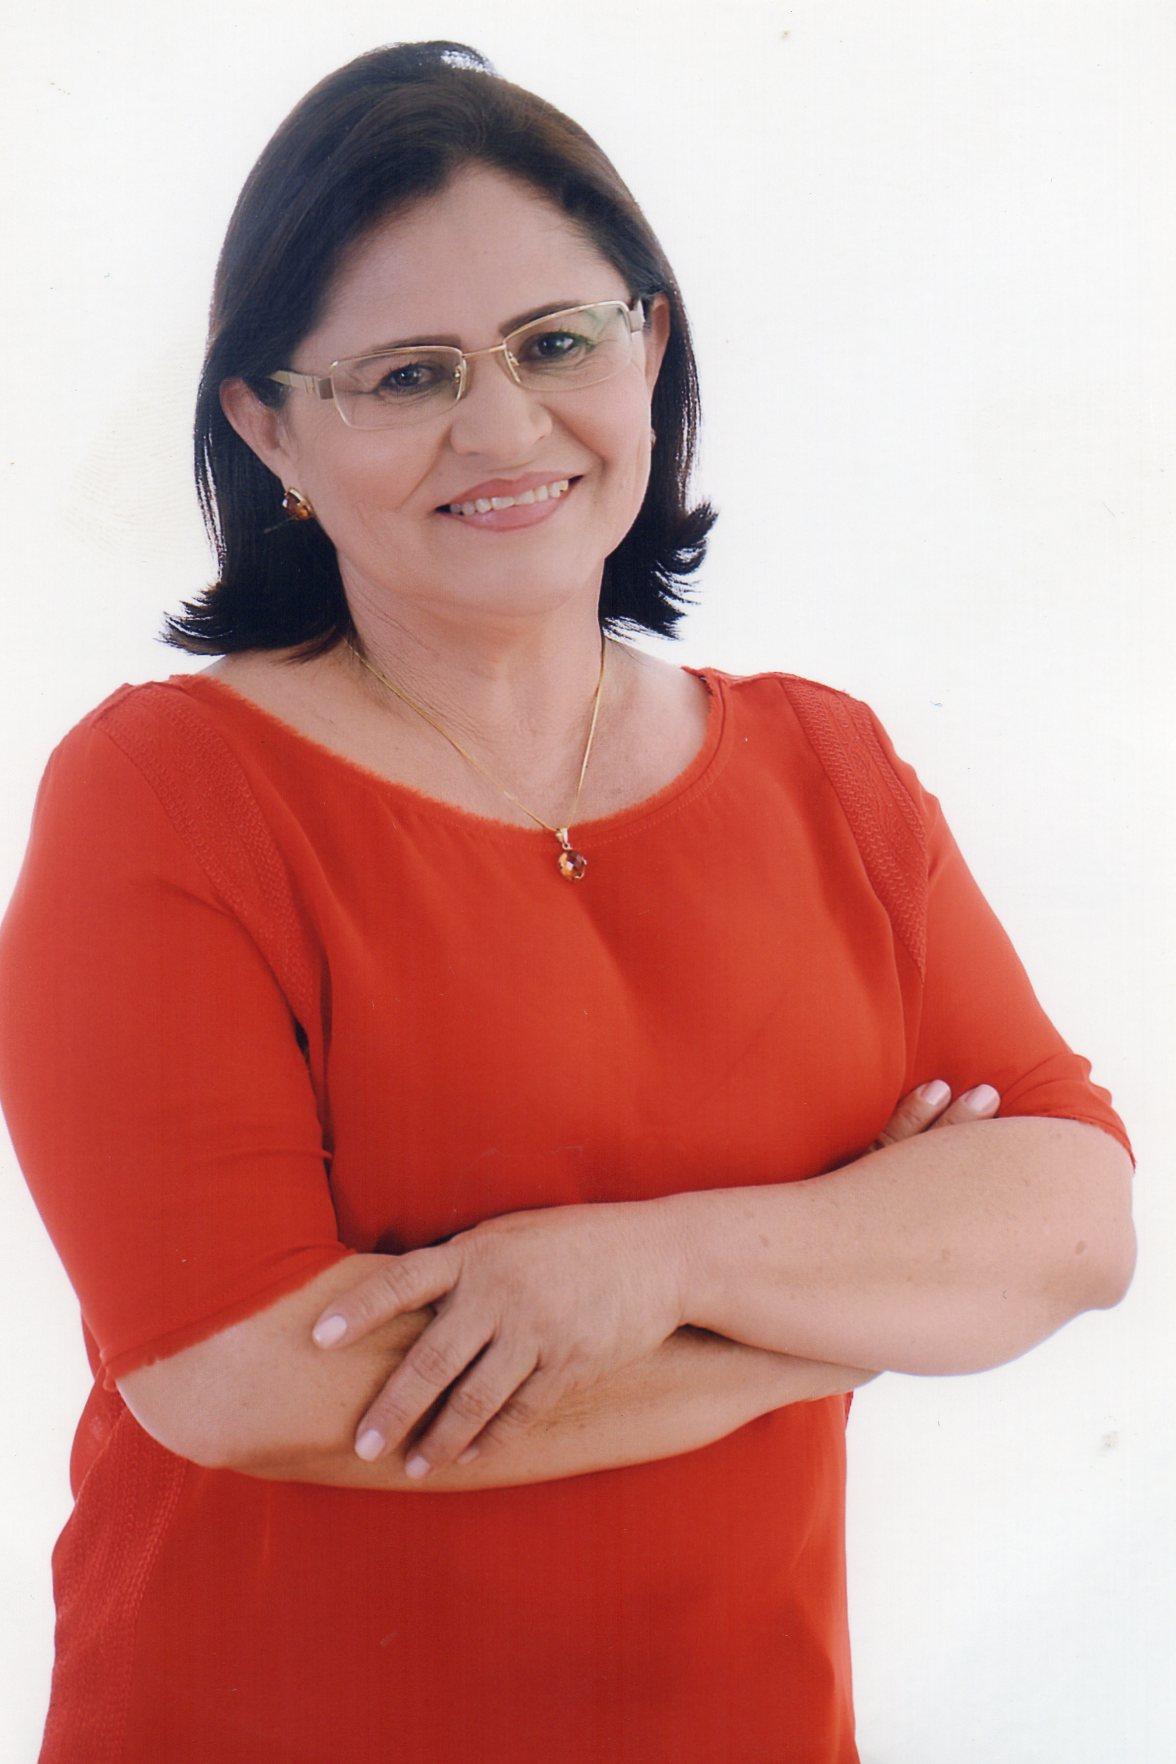 Maricélia Ribeiro de Meneses Rocha (Biênio 2019/2020) - Vice-Presidente